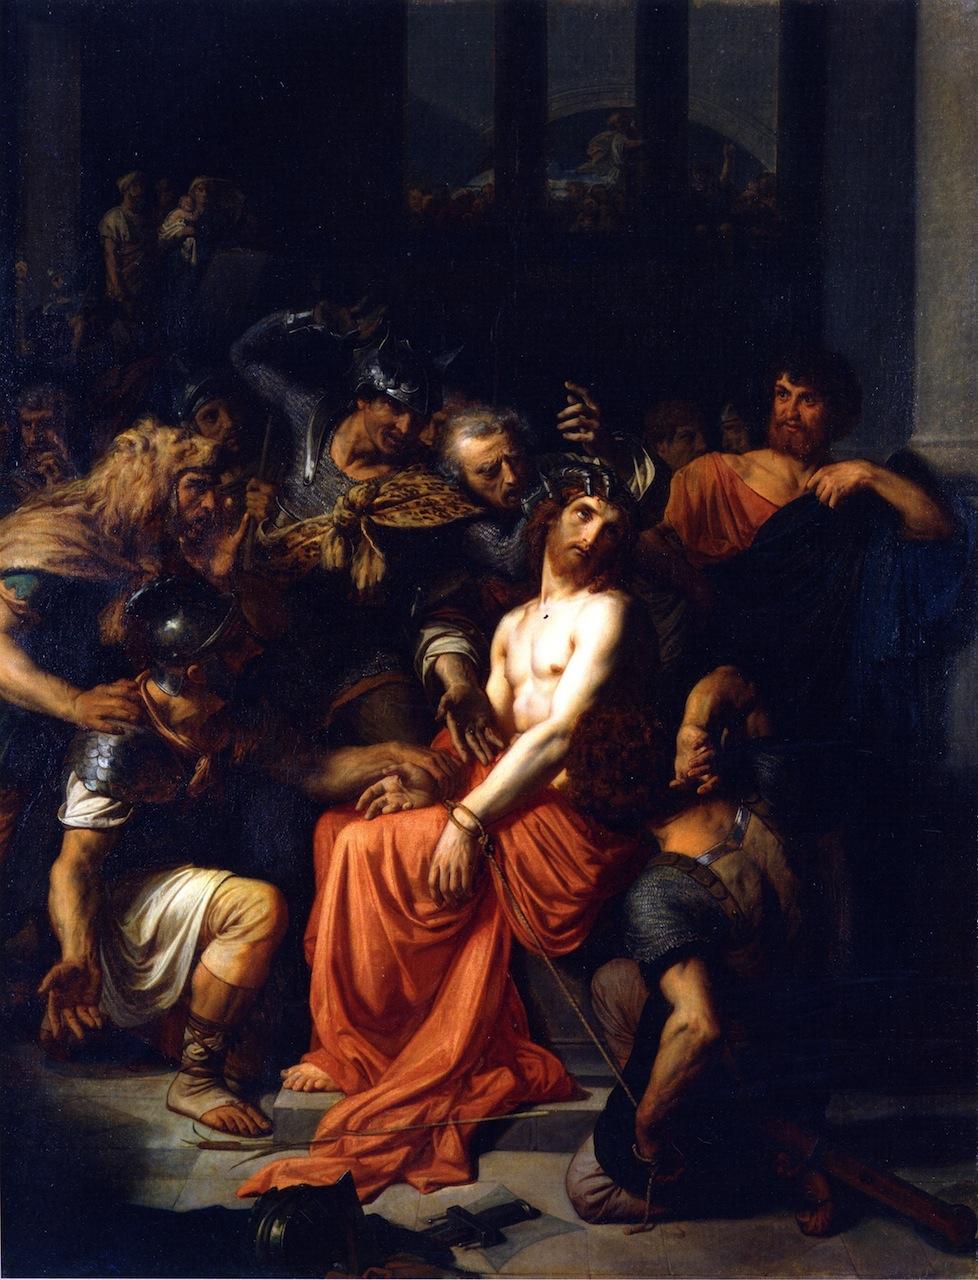 Alexandre-Cabanel-xx-The-Mocking-of-Christ-xx-Ecole-des-Beaux-Arts